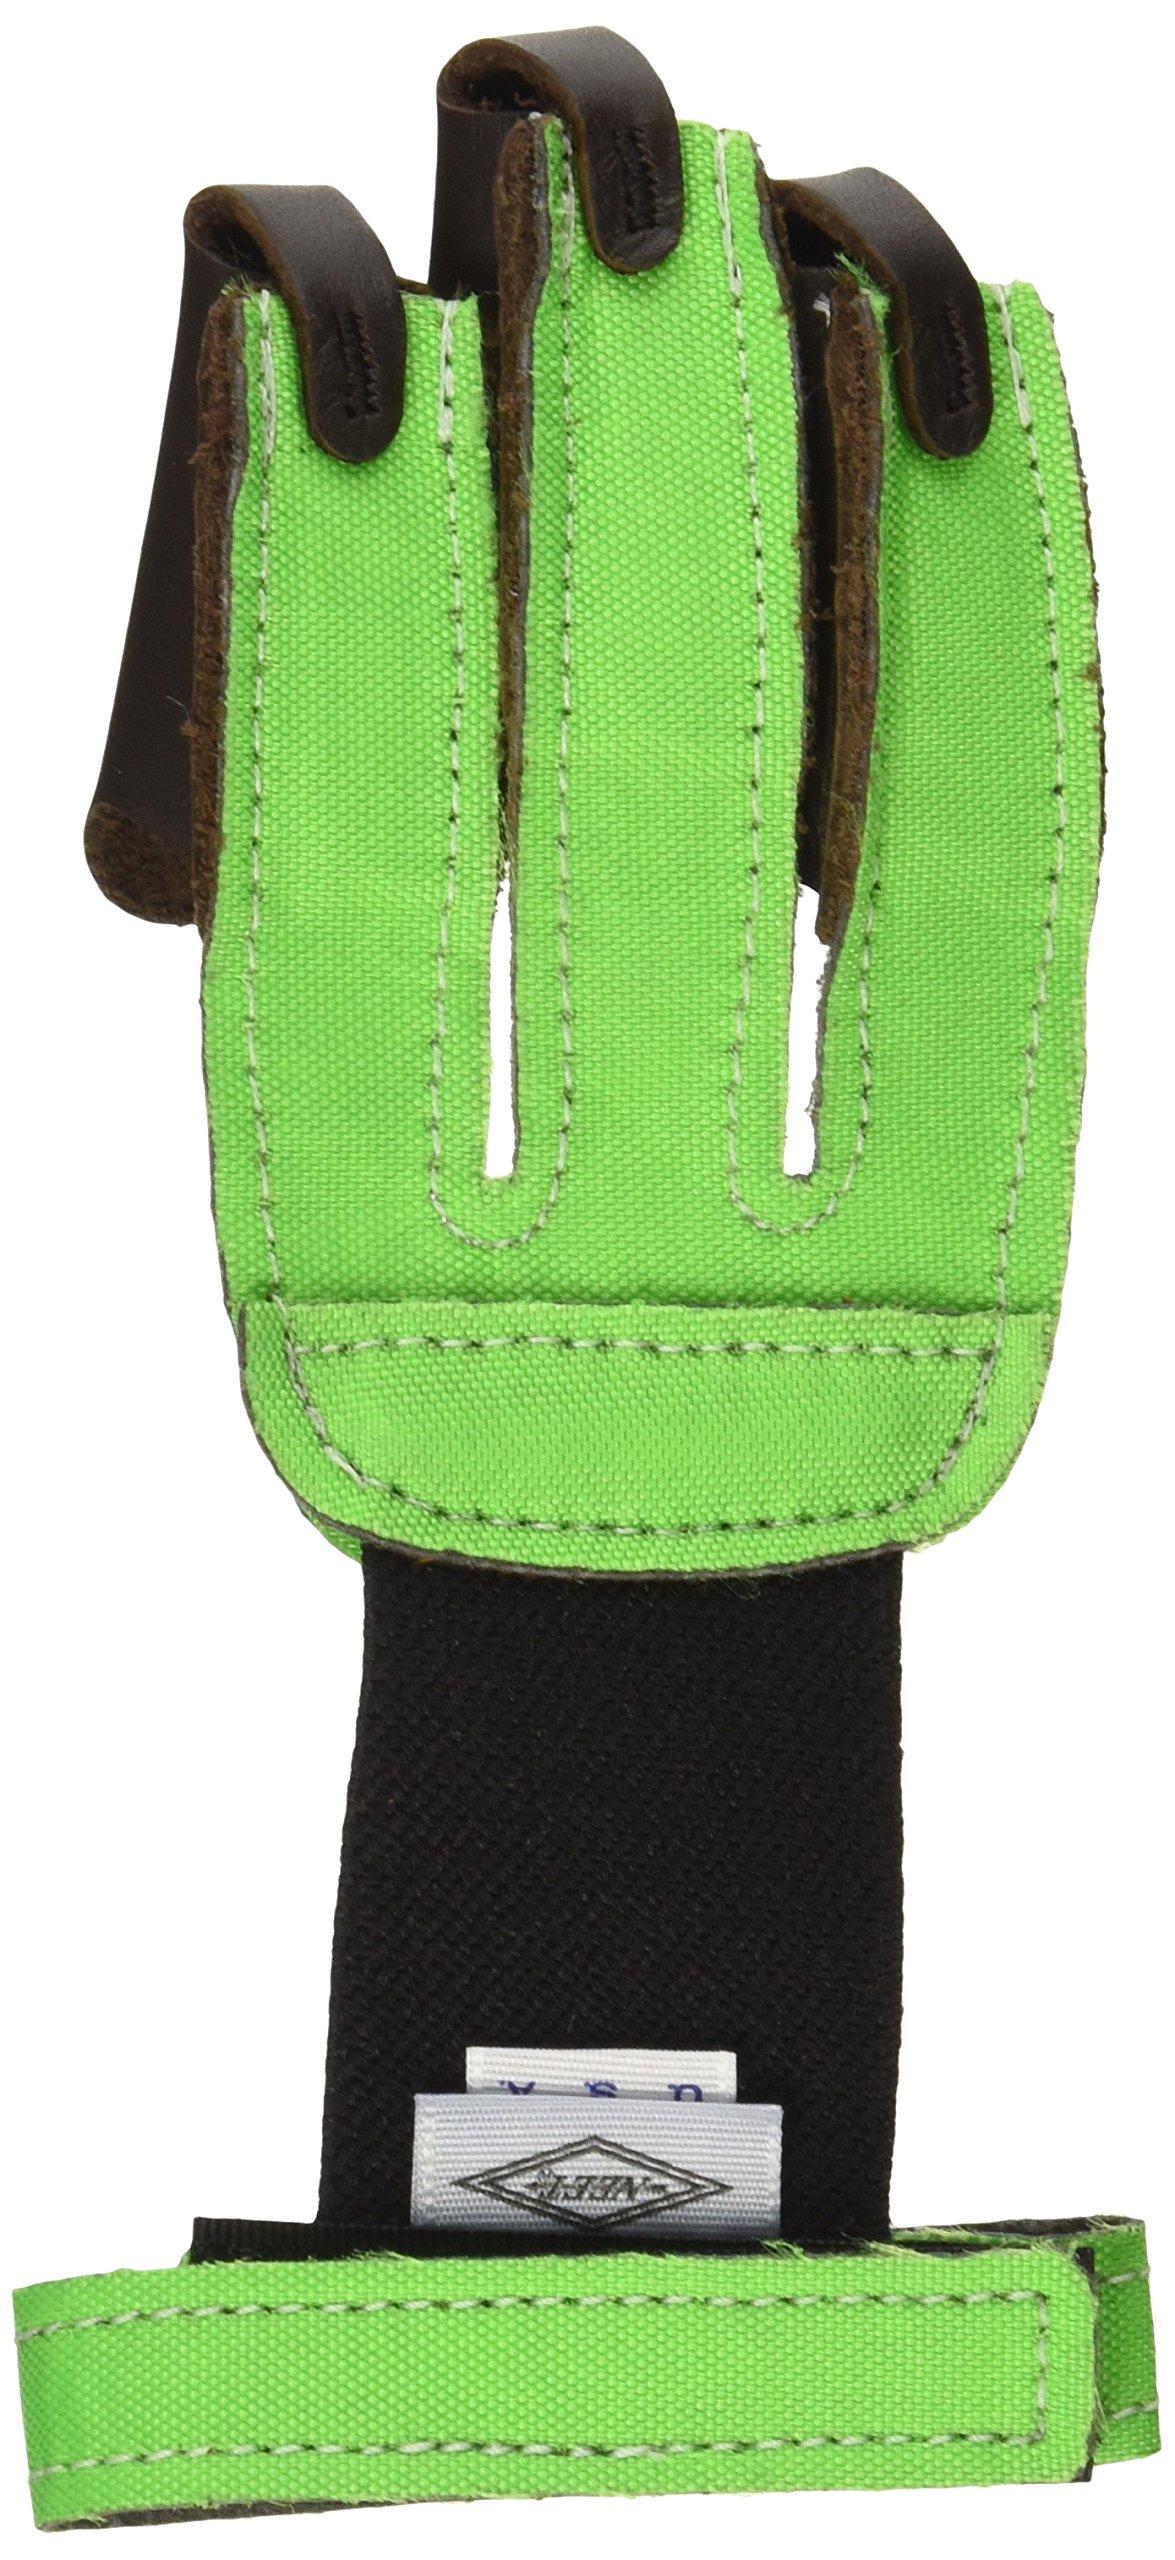 Neet 60021 FG-2N Gloves, Small, Neon Green